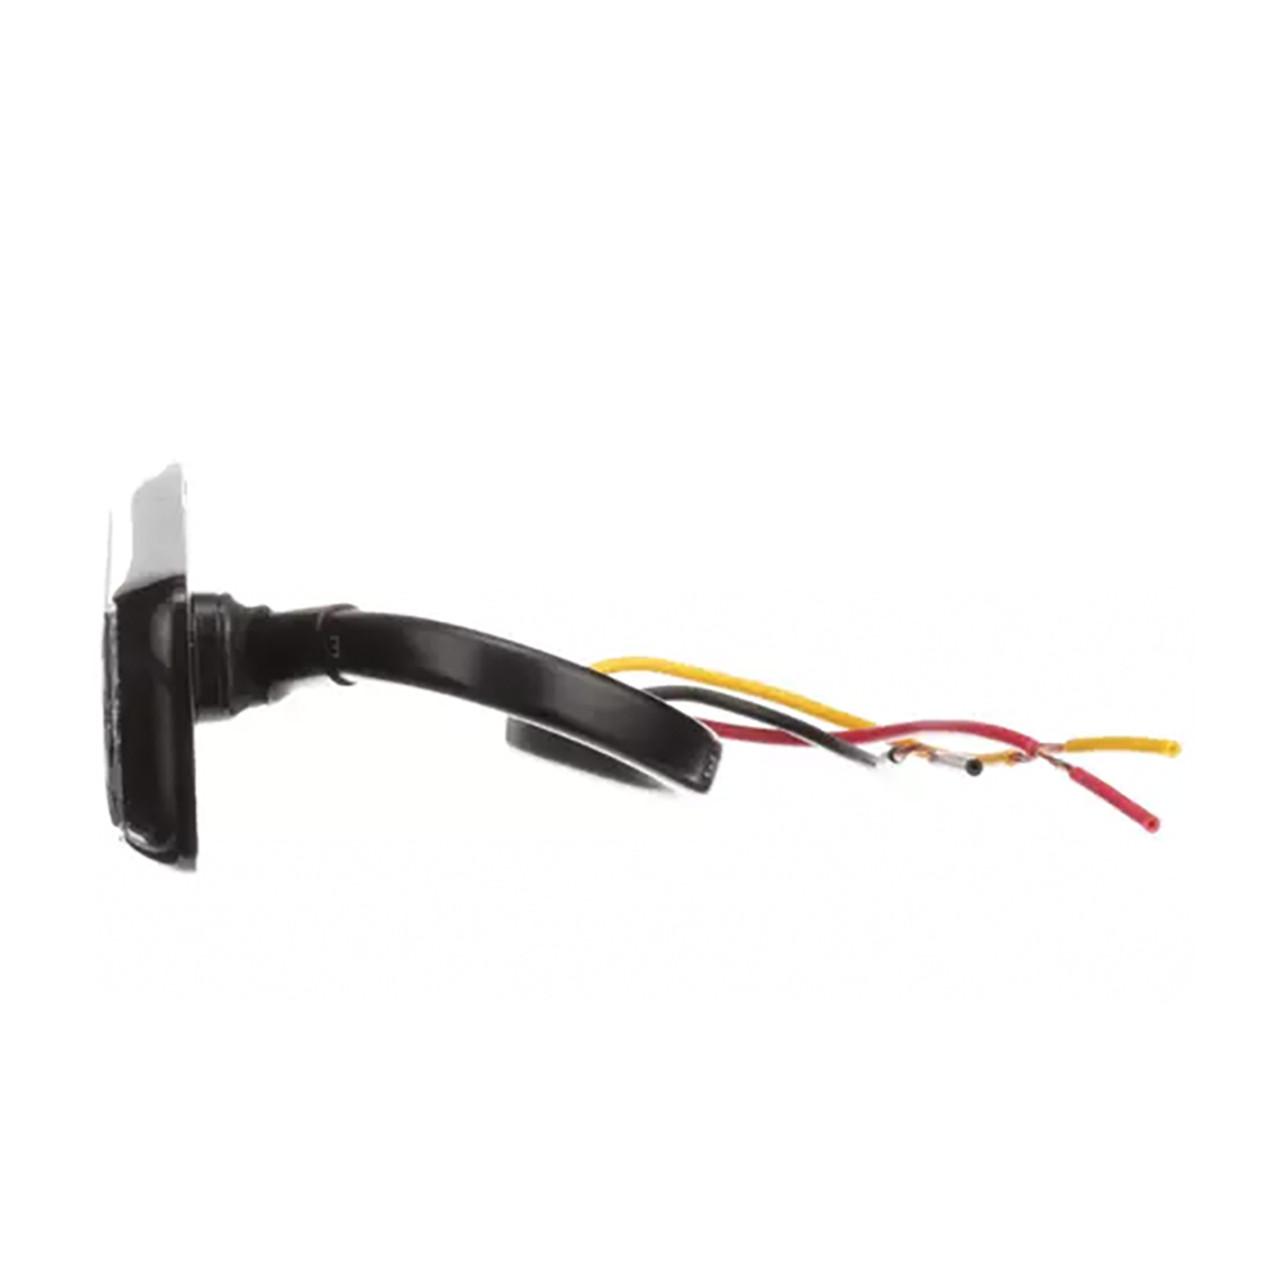 Federal Signal MicroPulse 3-LED or 6-LED Emergency Warning Light Heads